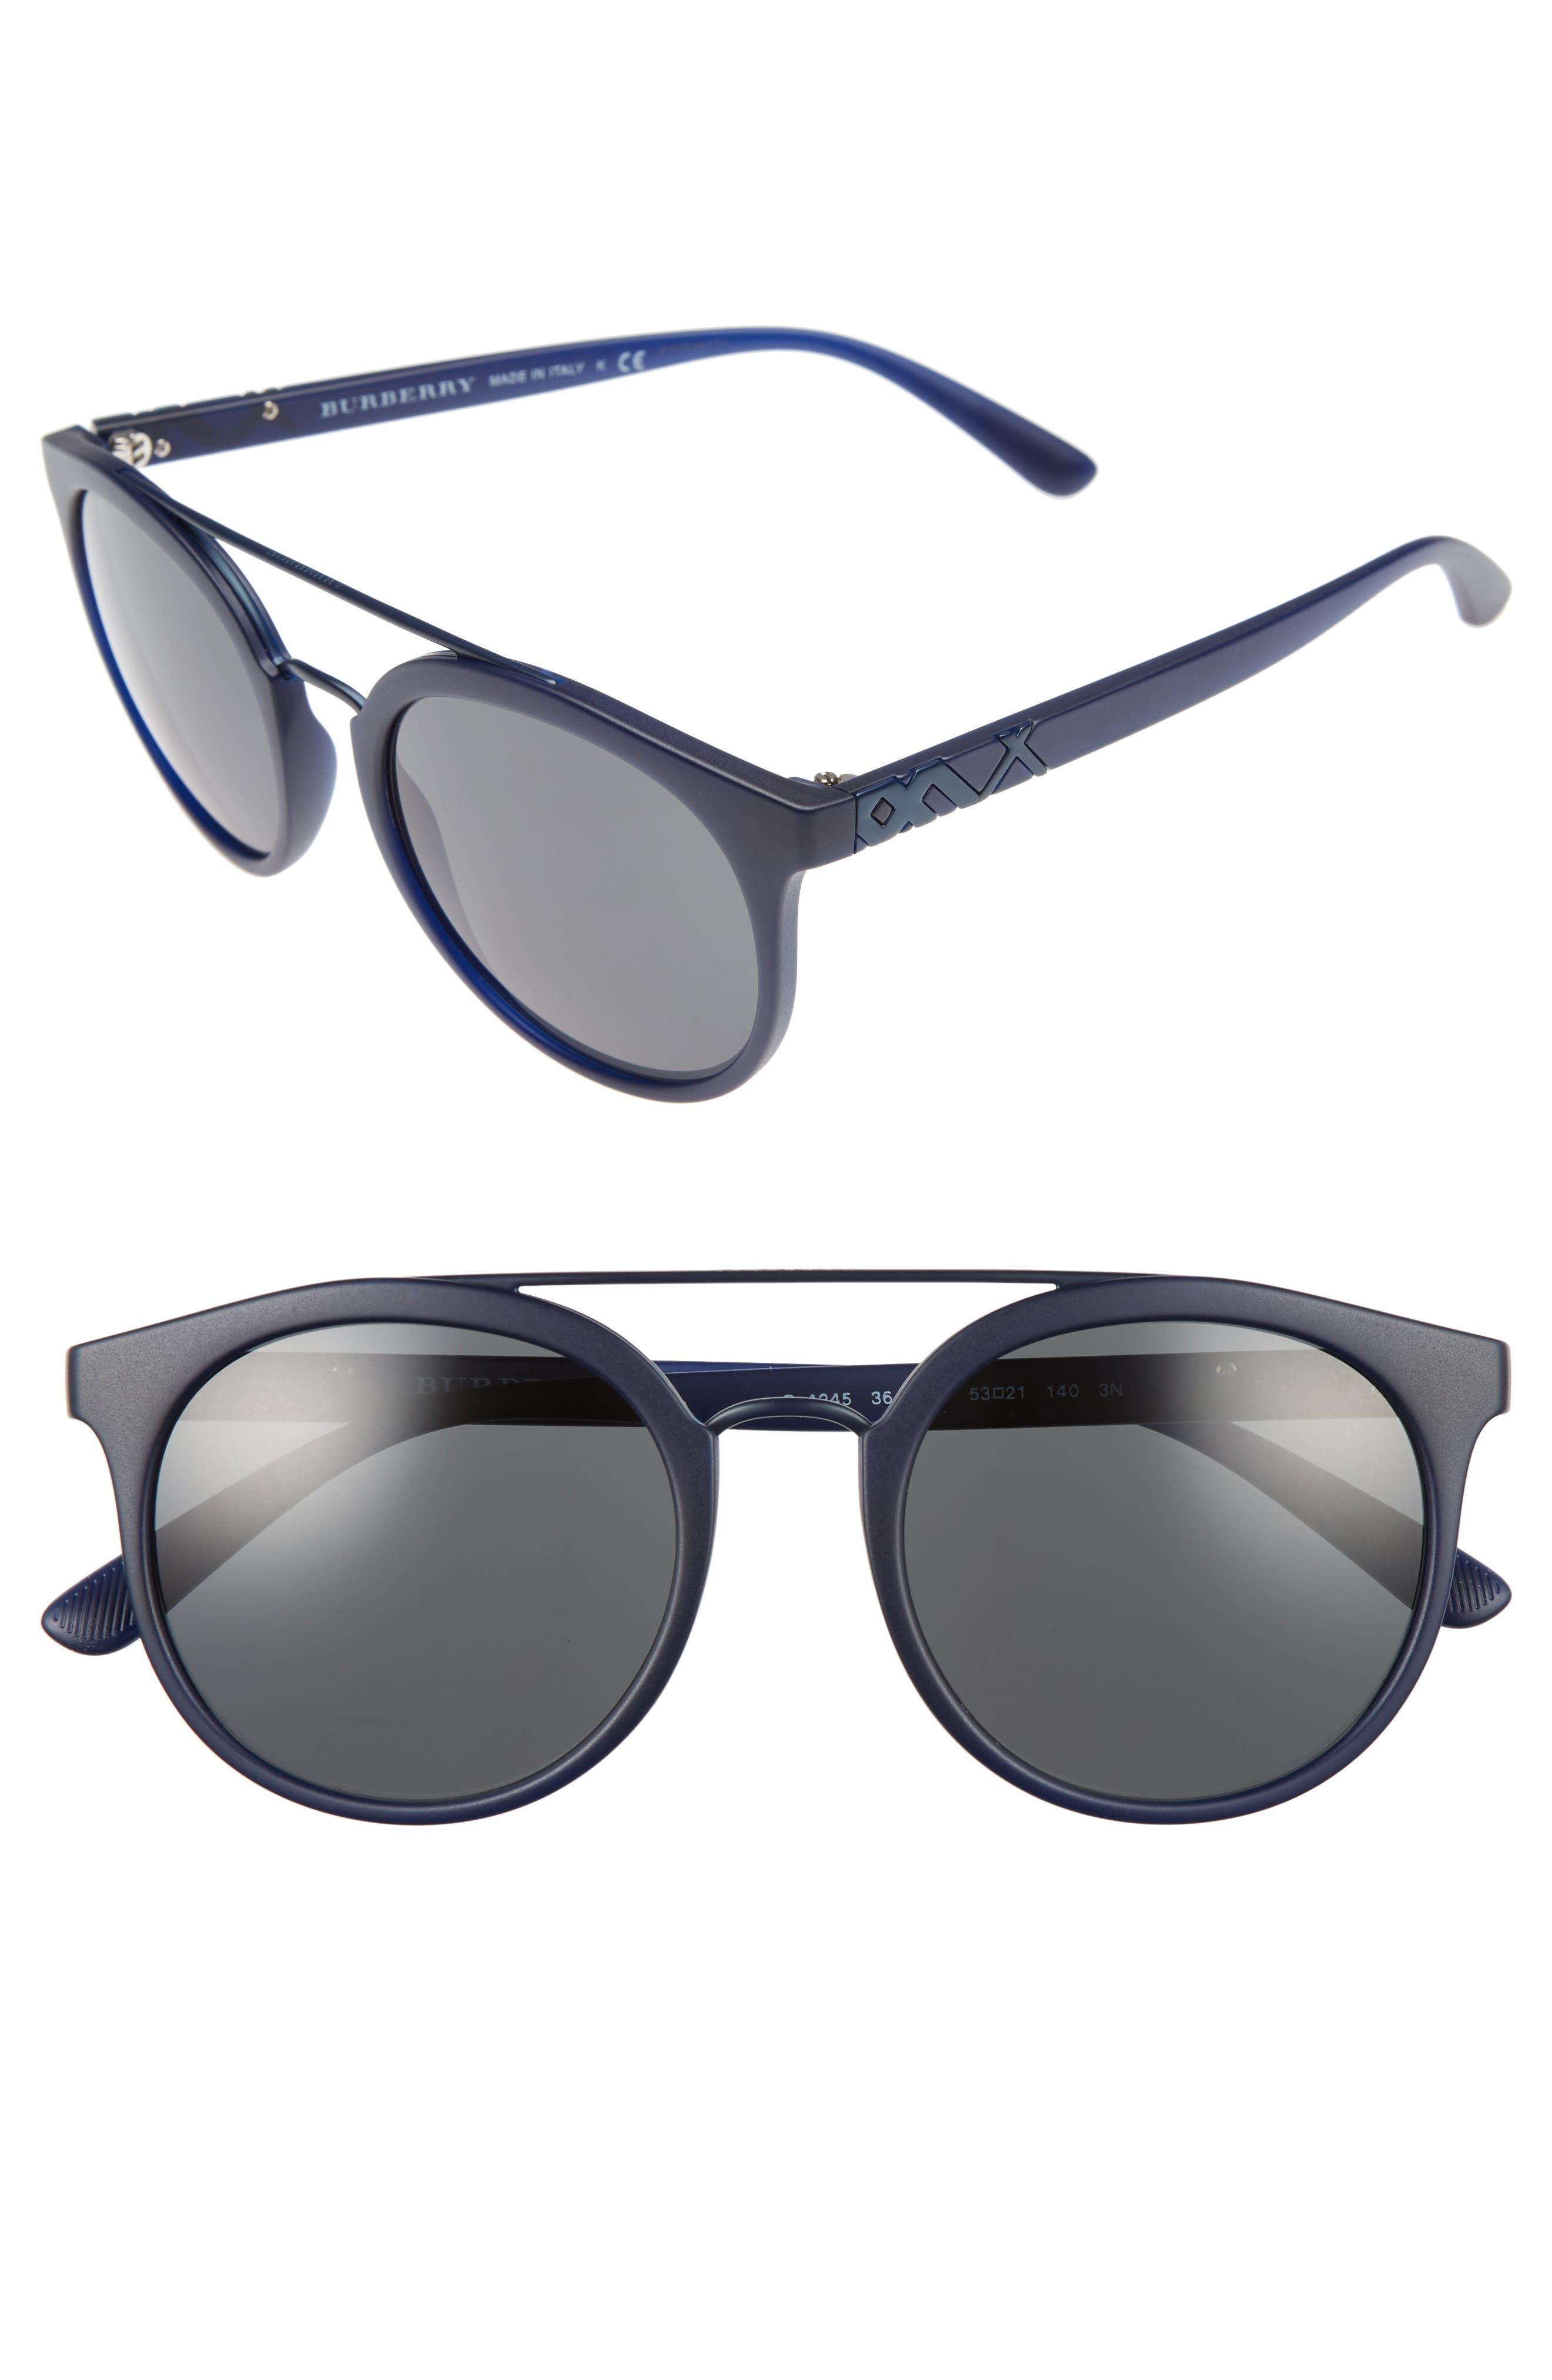 Burberry 53mm Round Sunglasses